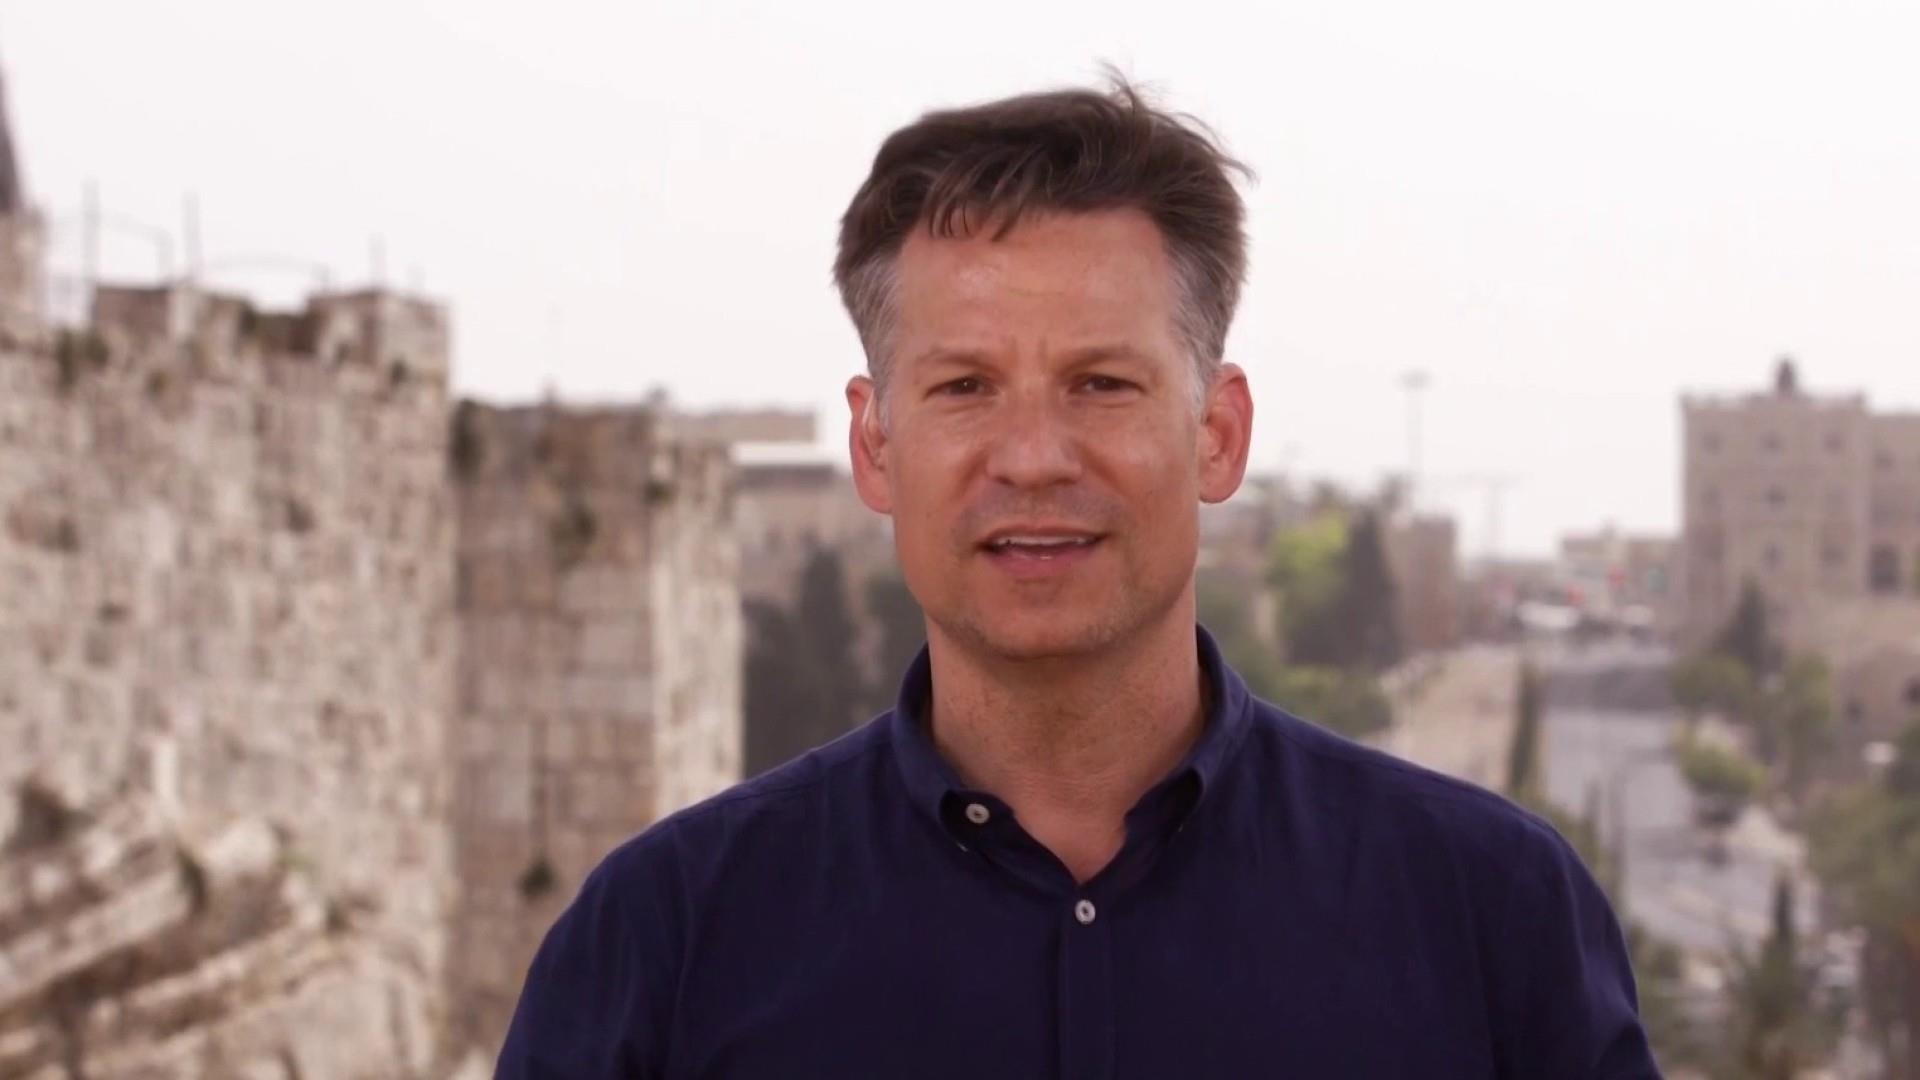 Richard Engel investigates Black Cube